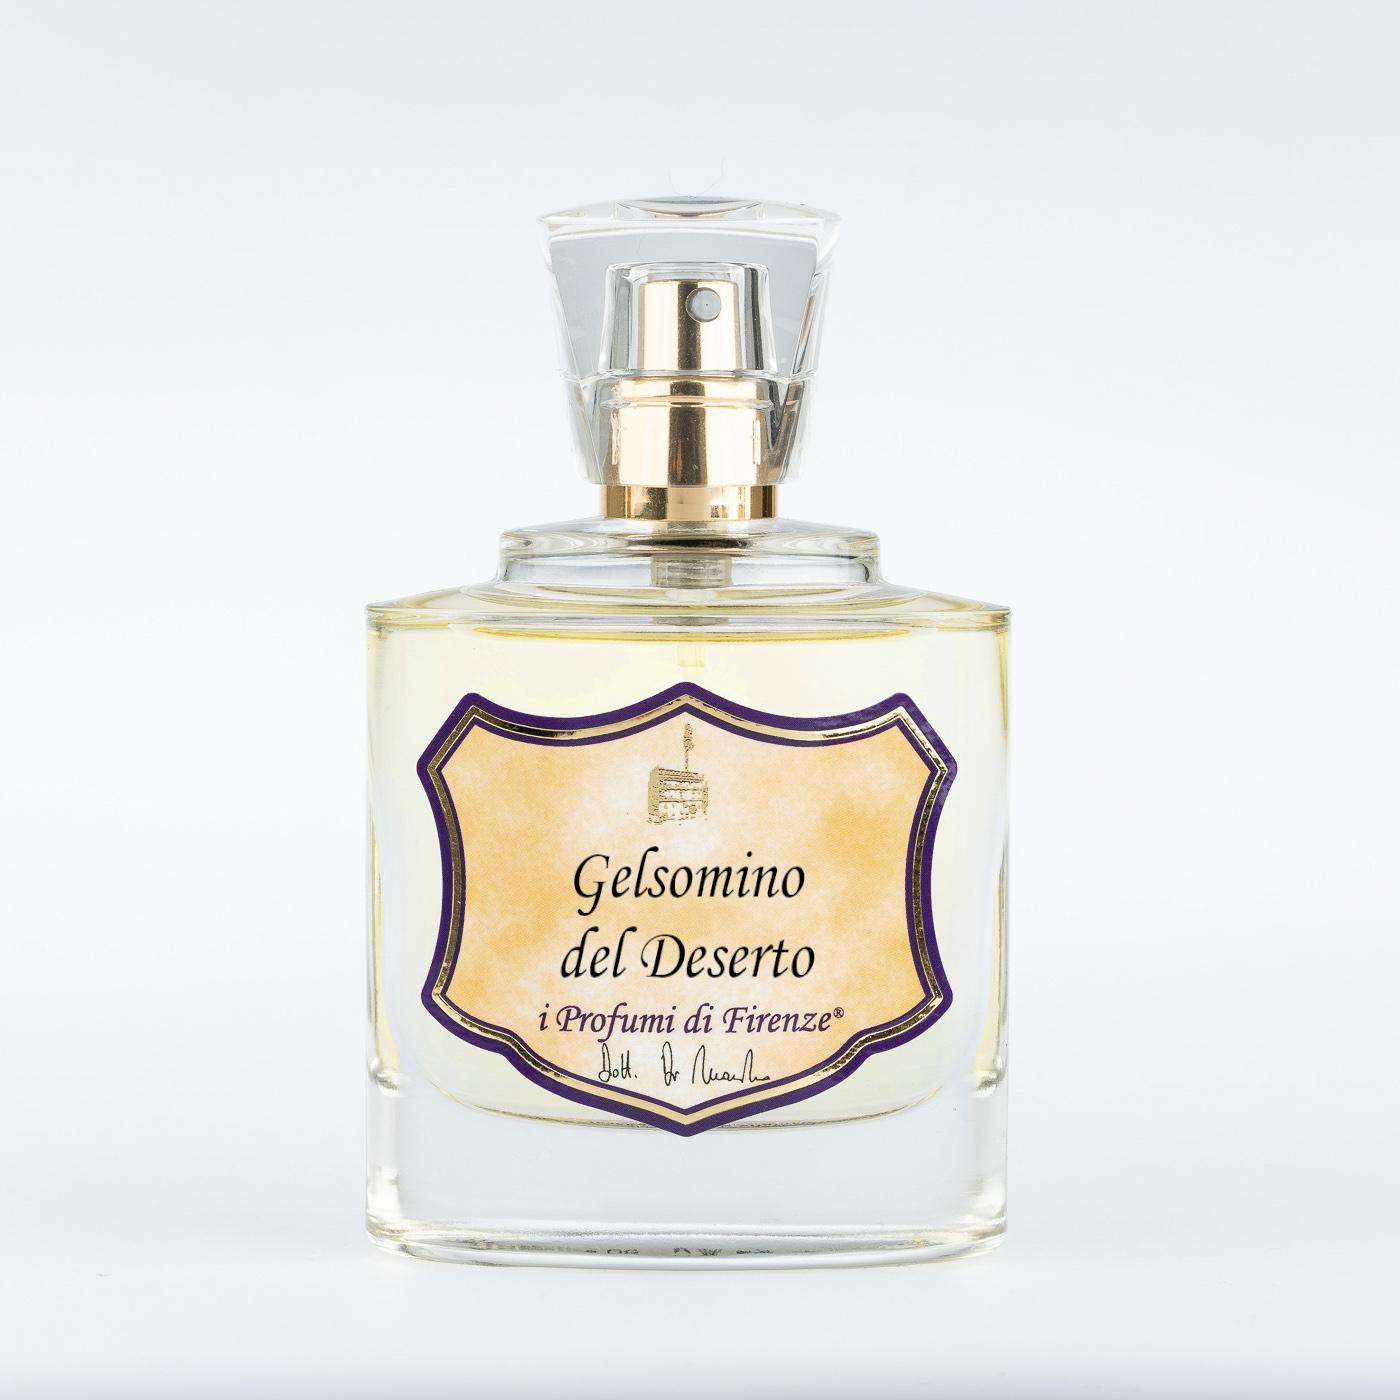 GELSOMINO DEL DESERTO - Eau de Parfum-3744